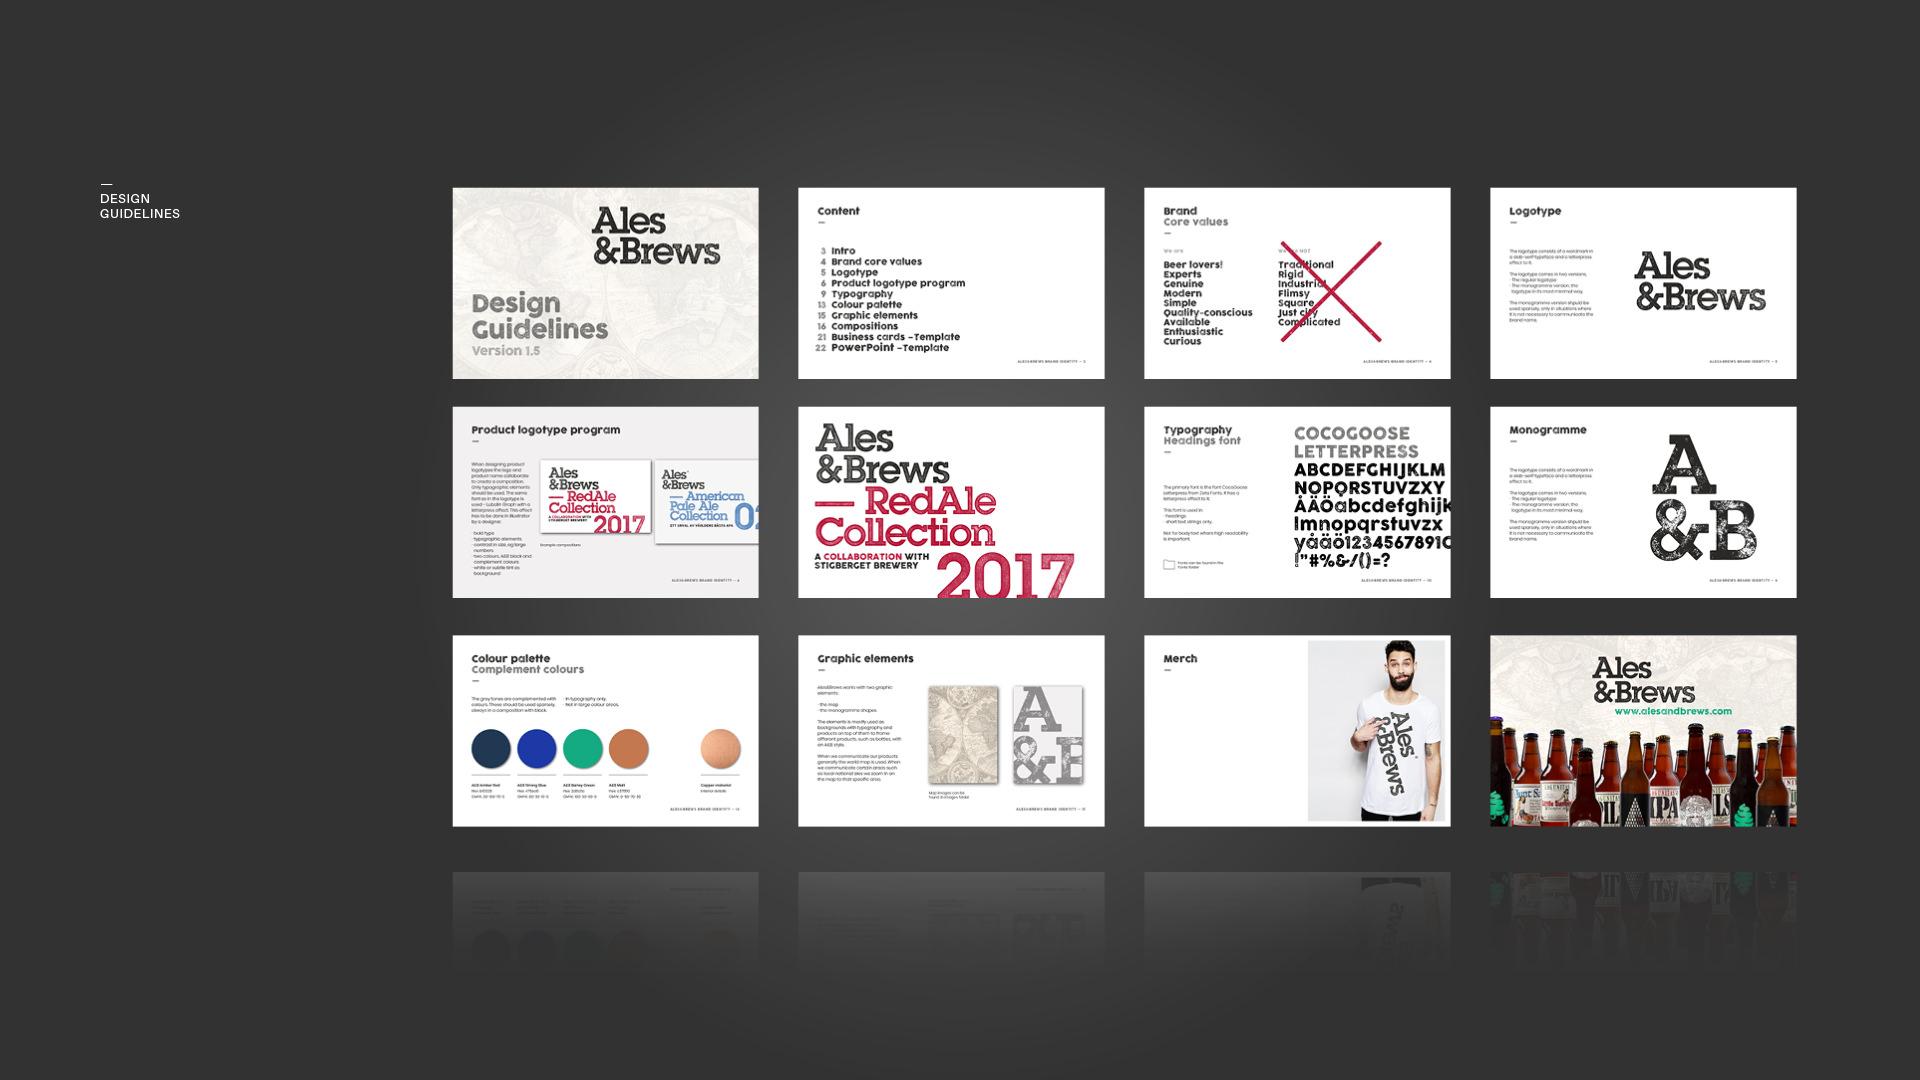 design-guidelines-design-ales-brews